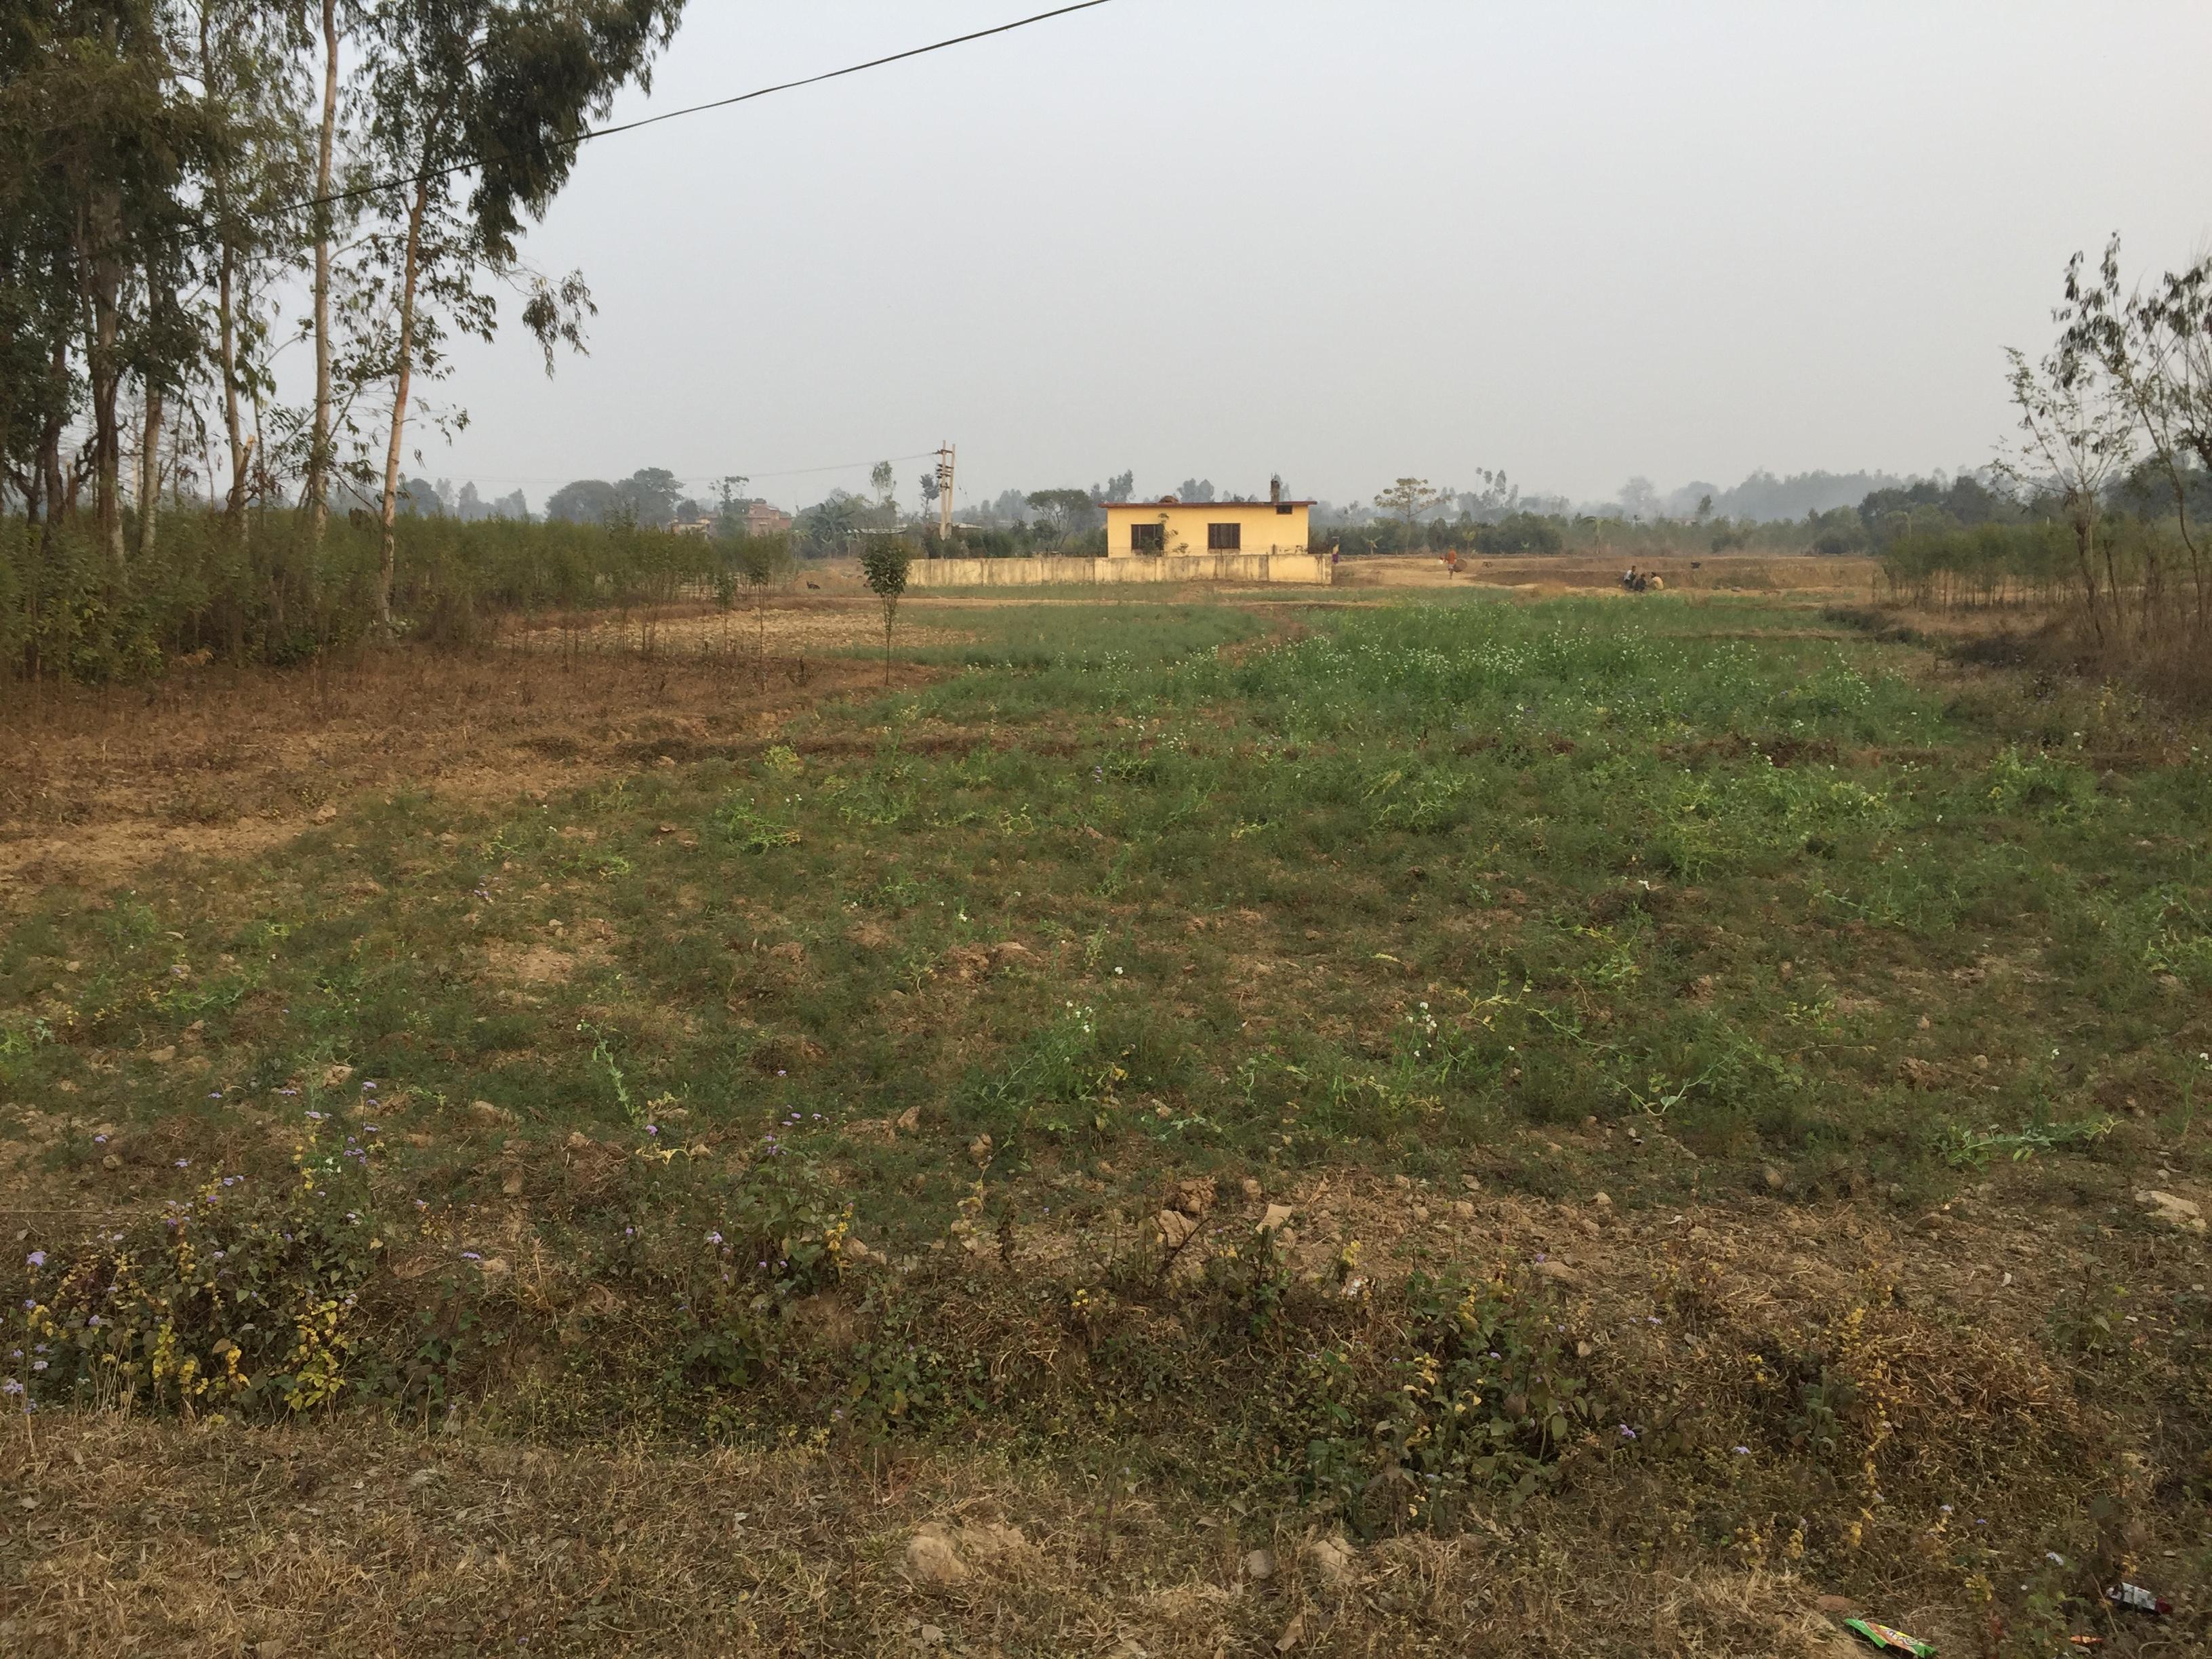 5 Ropani Plot available for sale in Bhimdunga, Kathmandu – IMG_1983